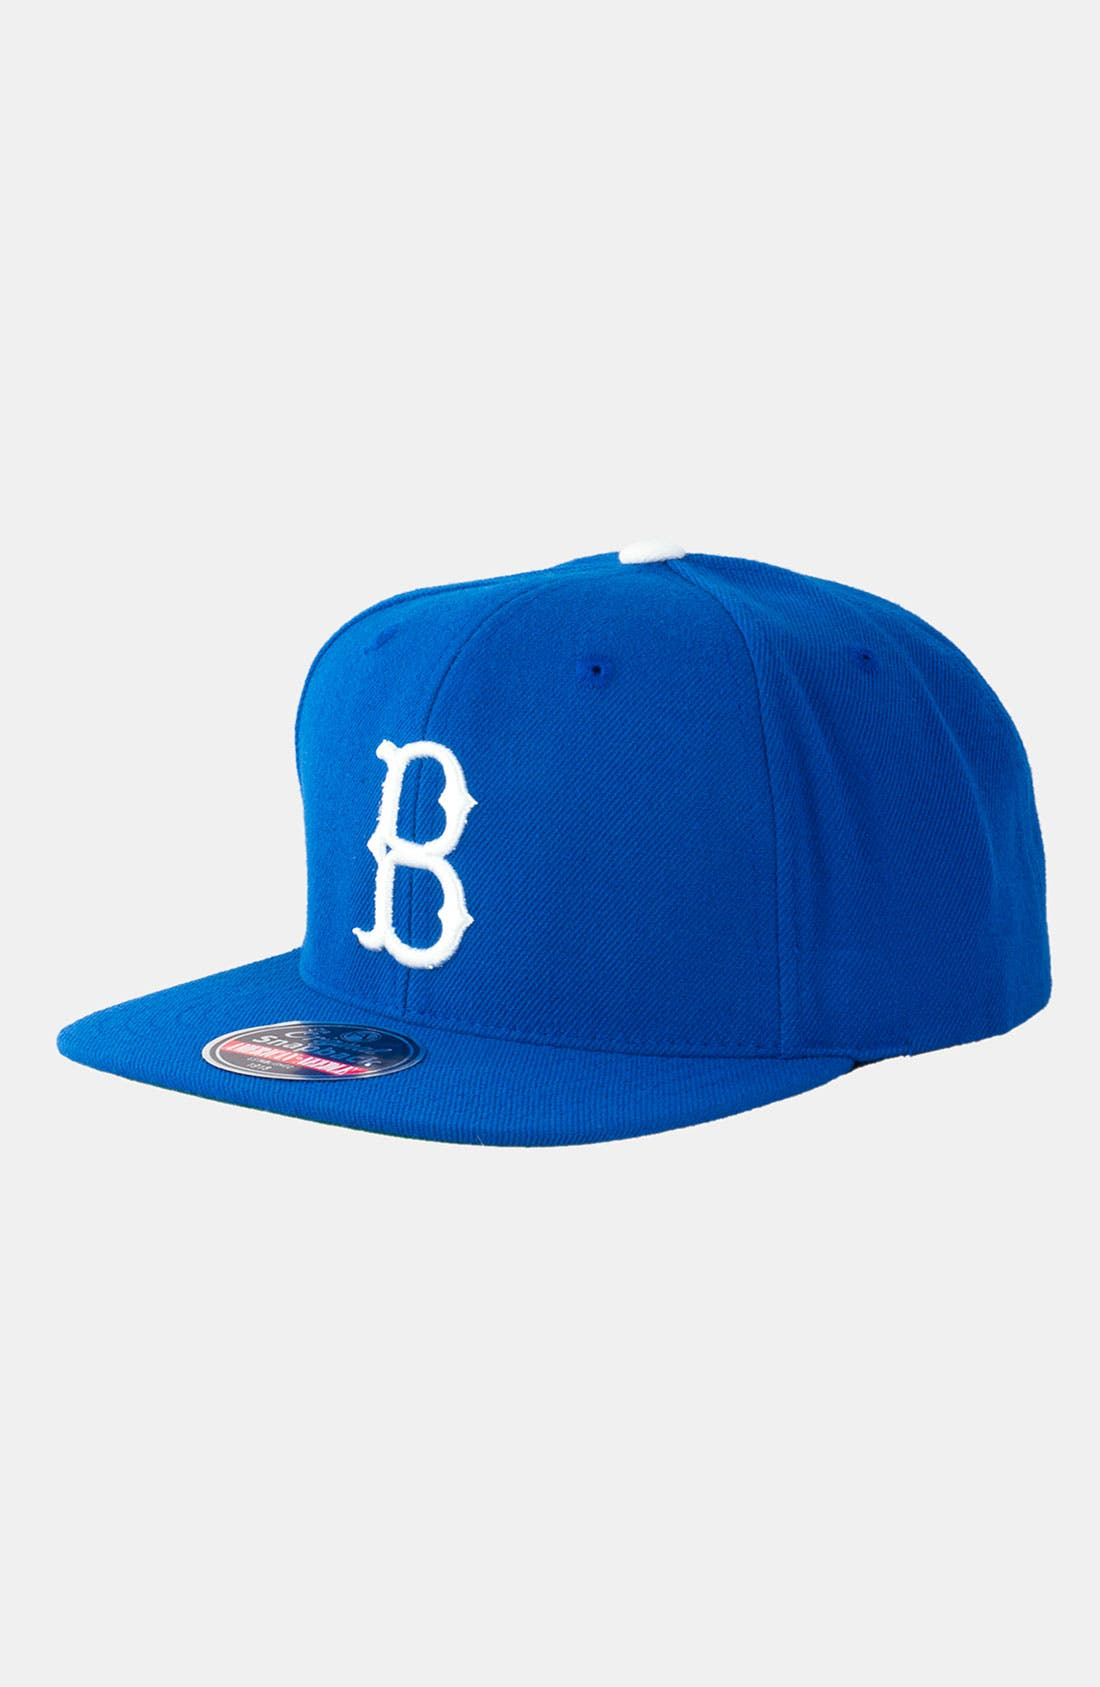 Alternate Image 1 Selected - American Needle 'Brooklyn Dodgers - Cooperstown' Snapback Baseball Cap